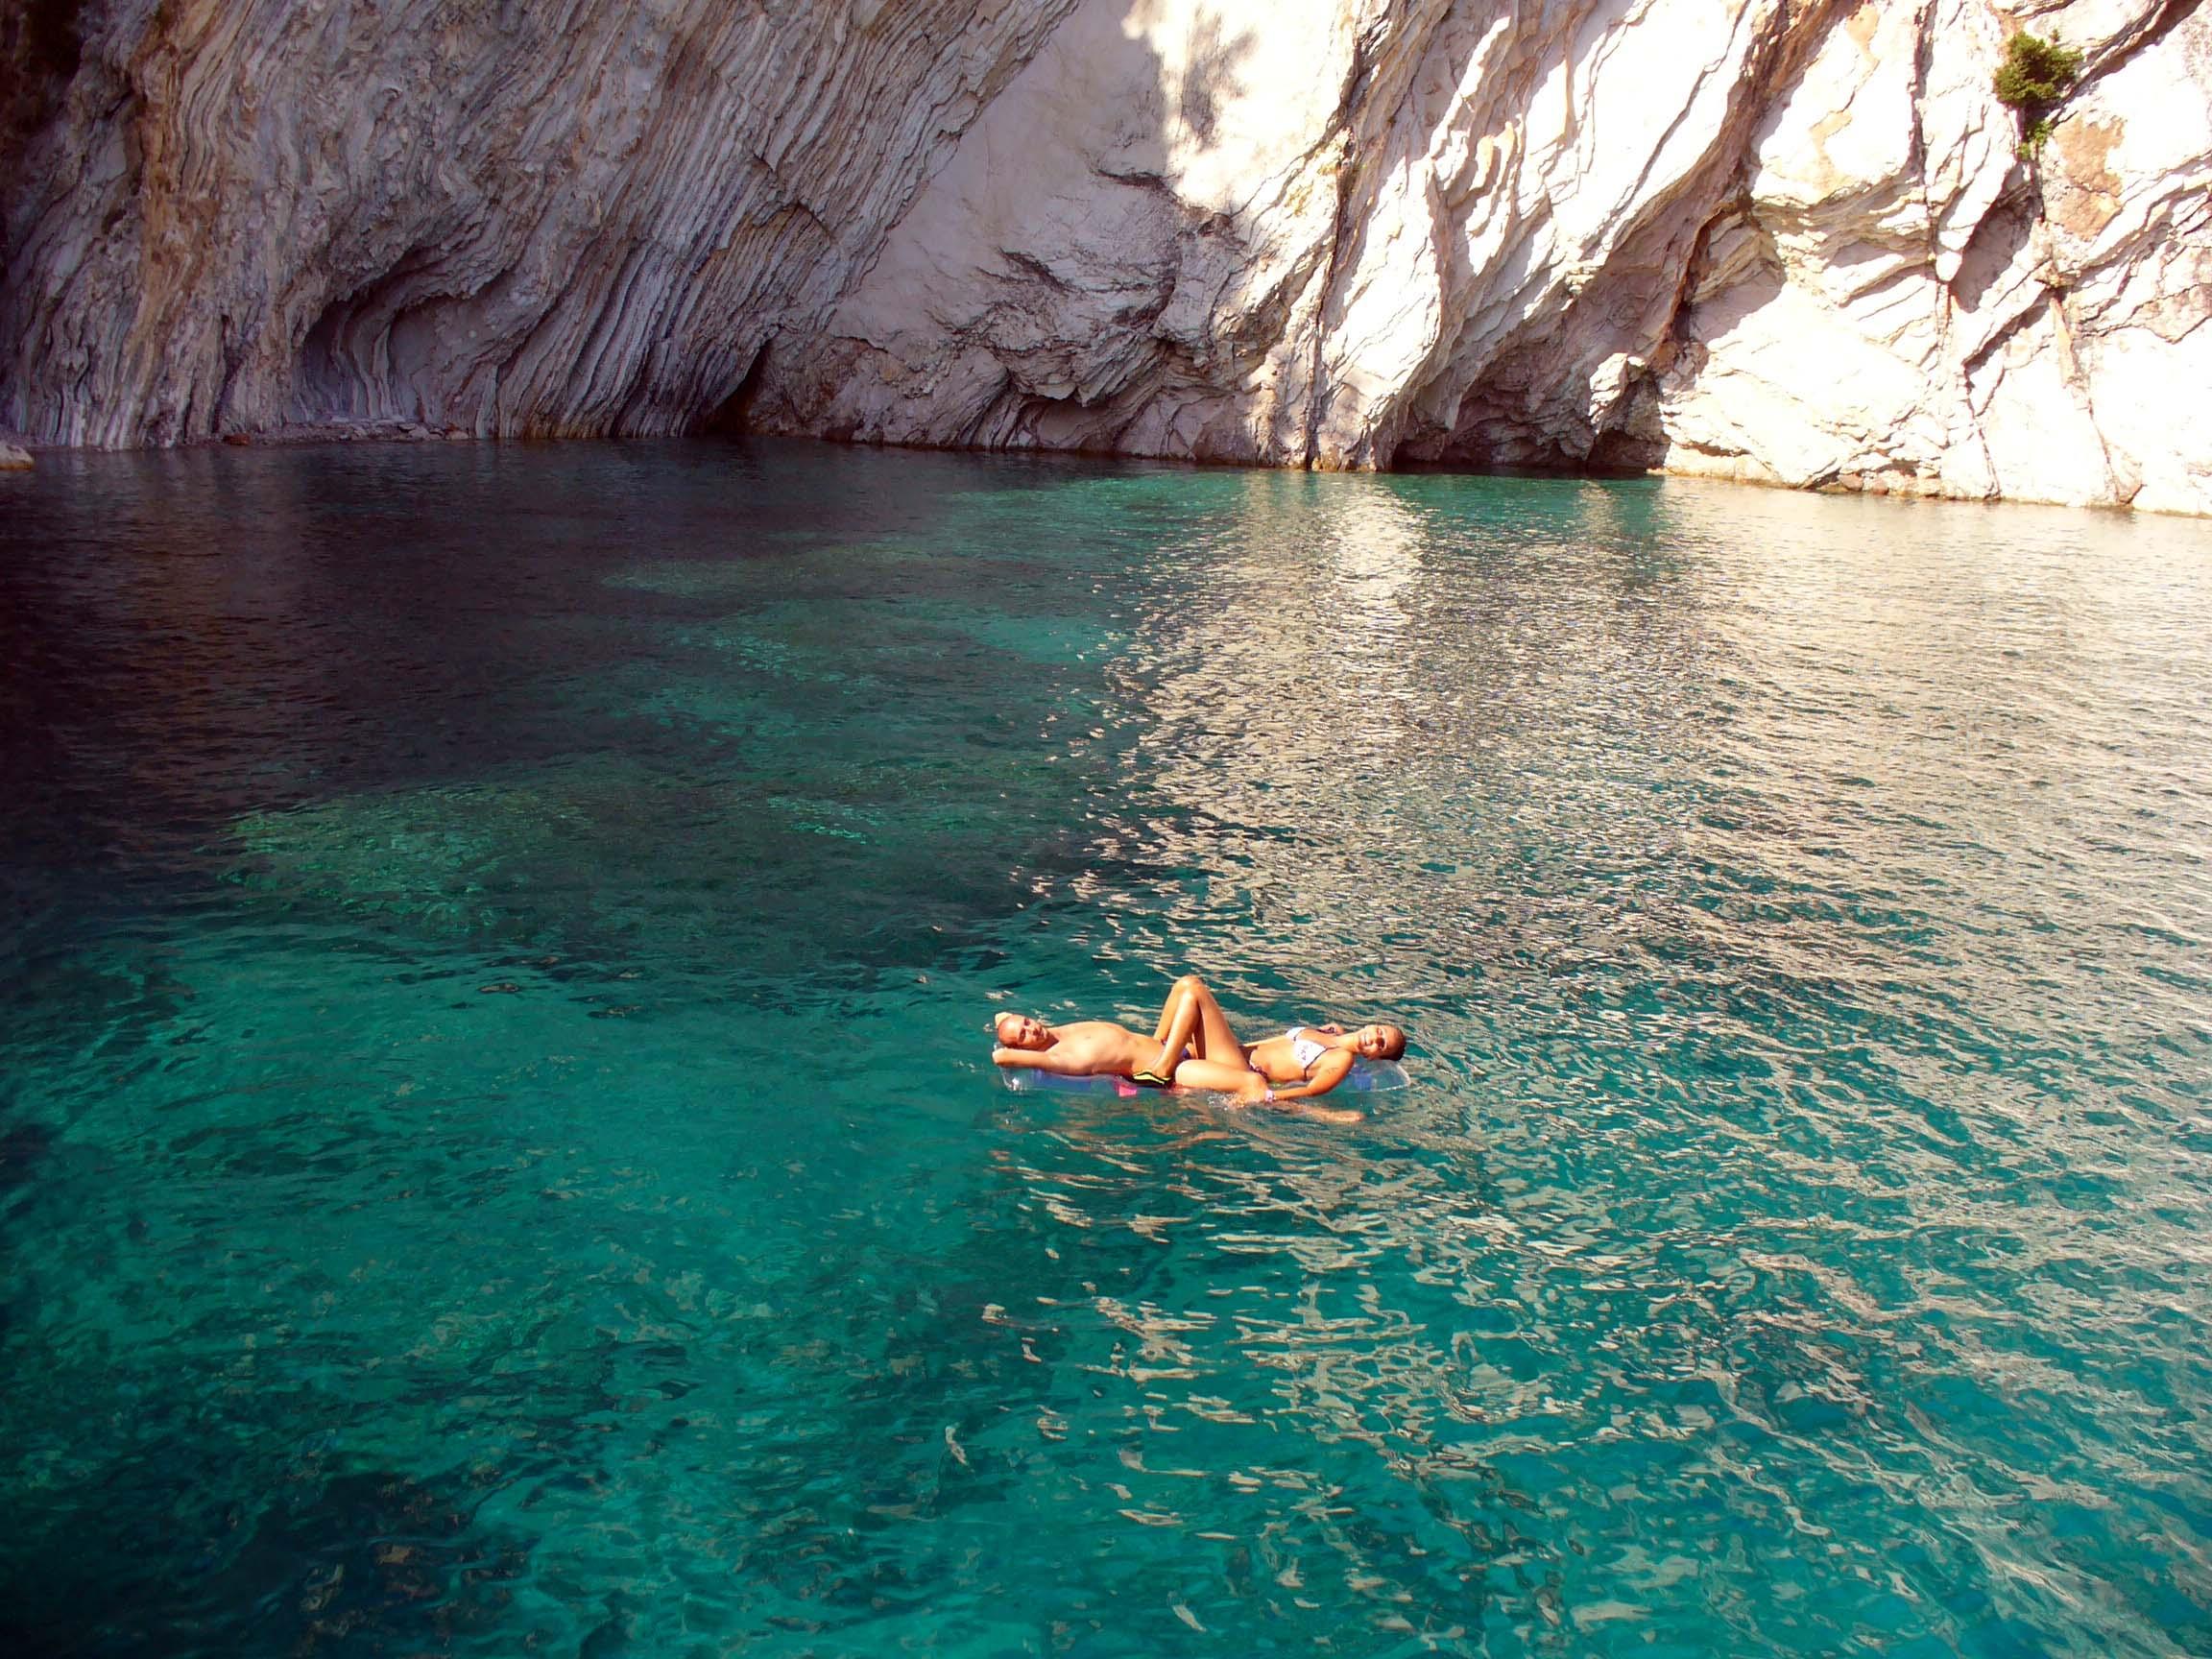 Vacanze a vela, Grecia ionica